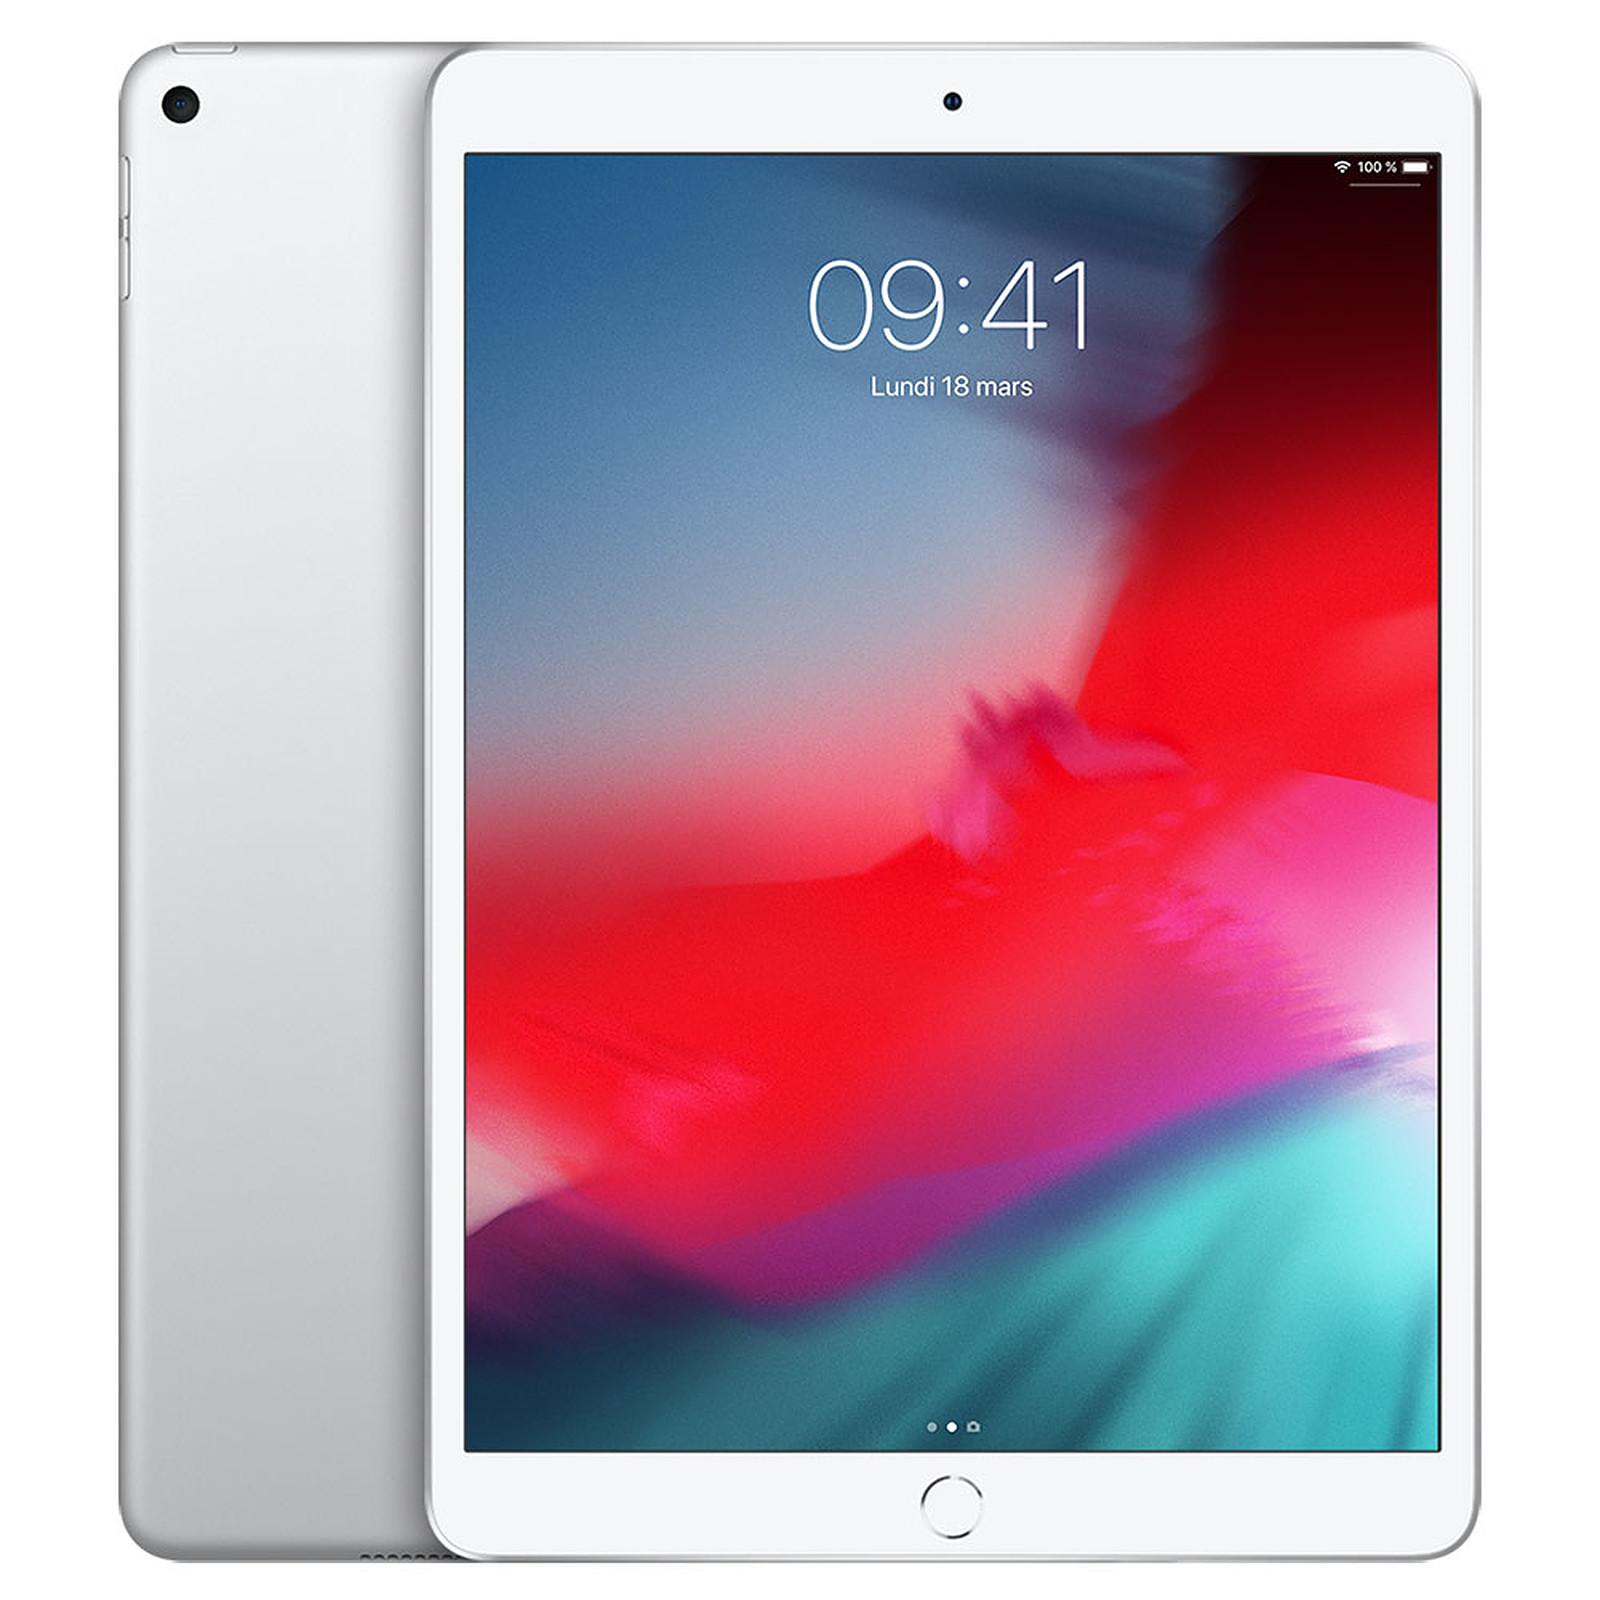 Apple iPad Air (2019) Wi-Fi 64GB Silver